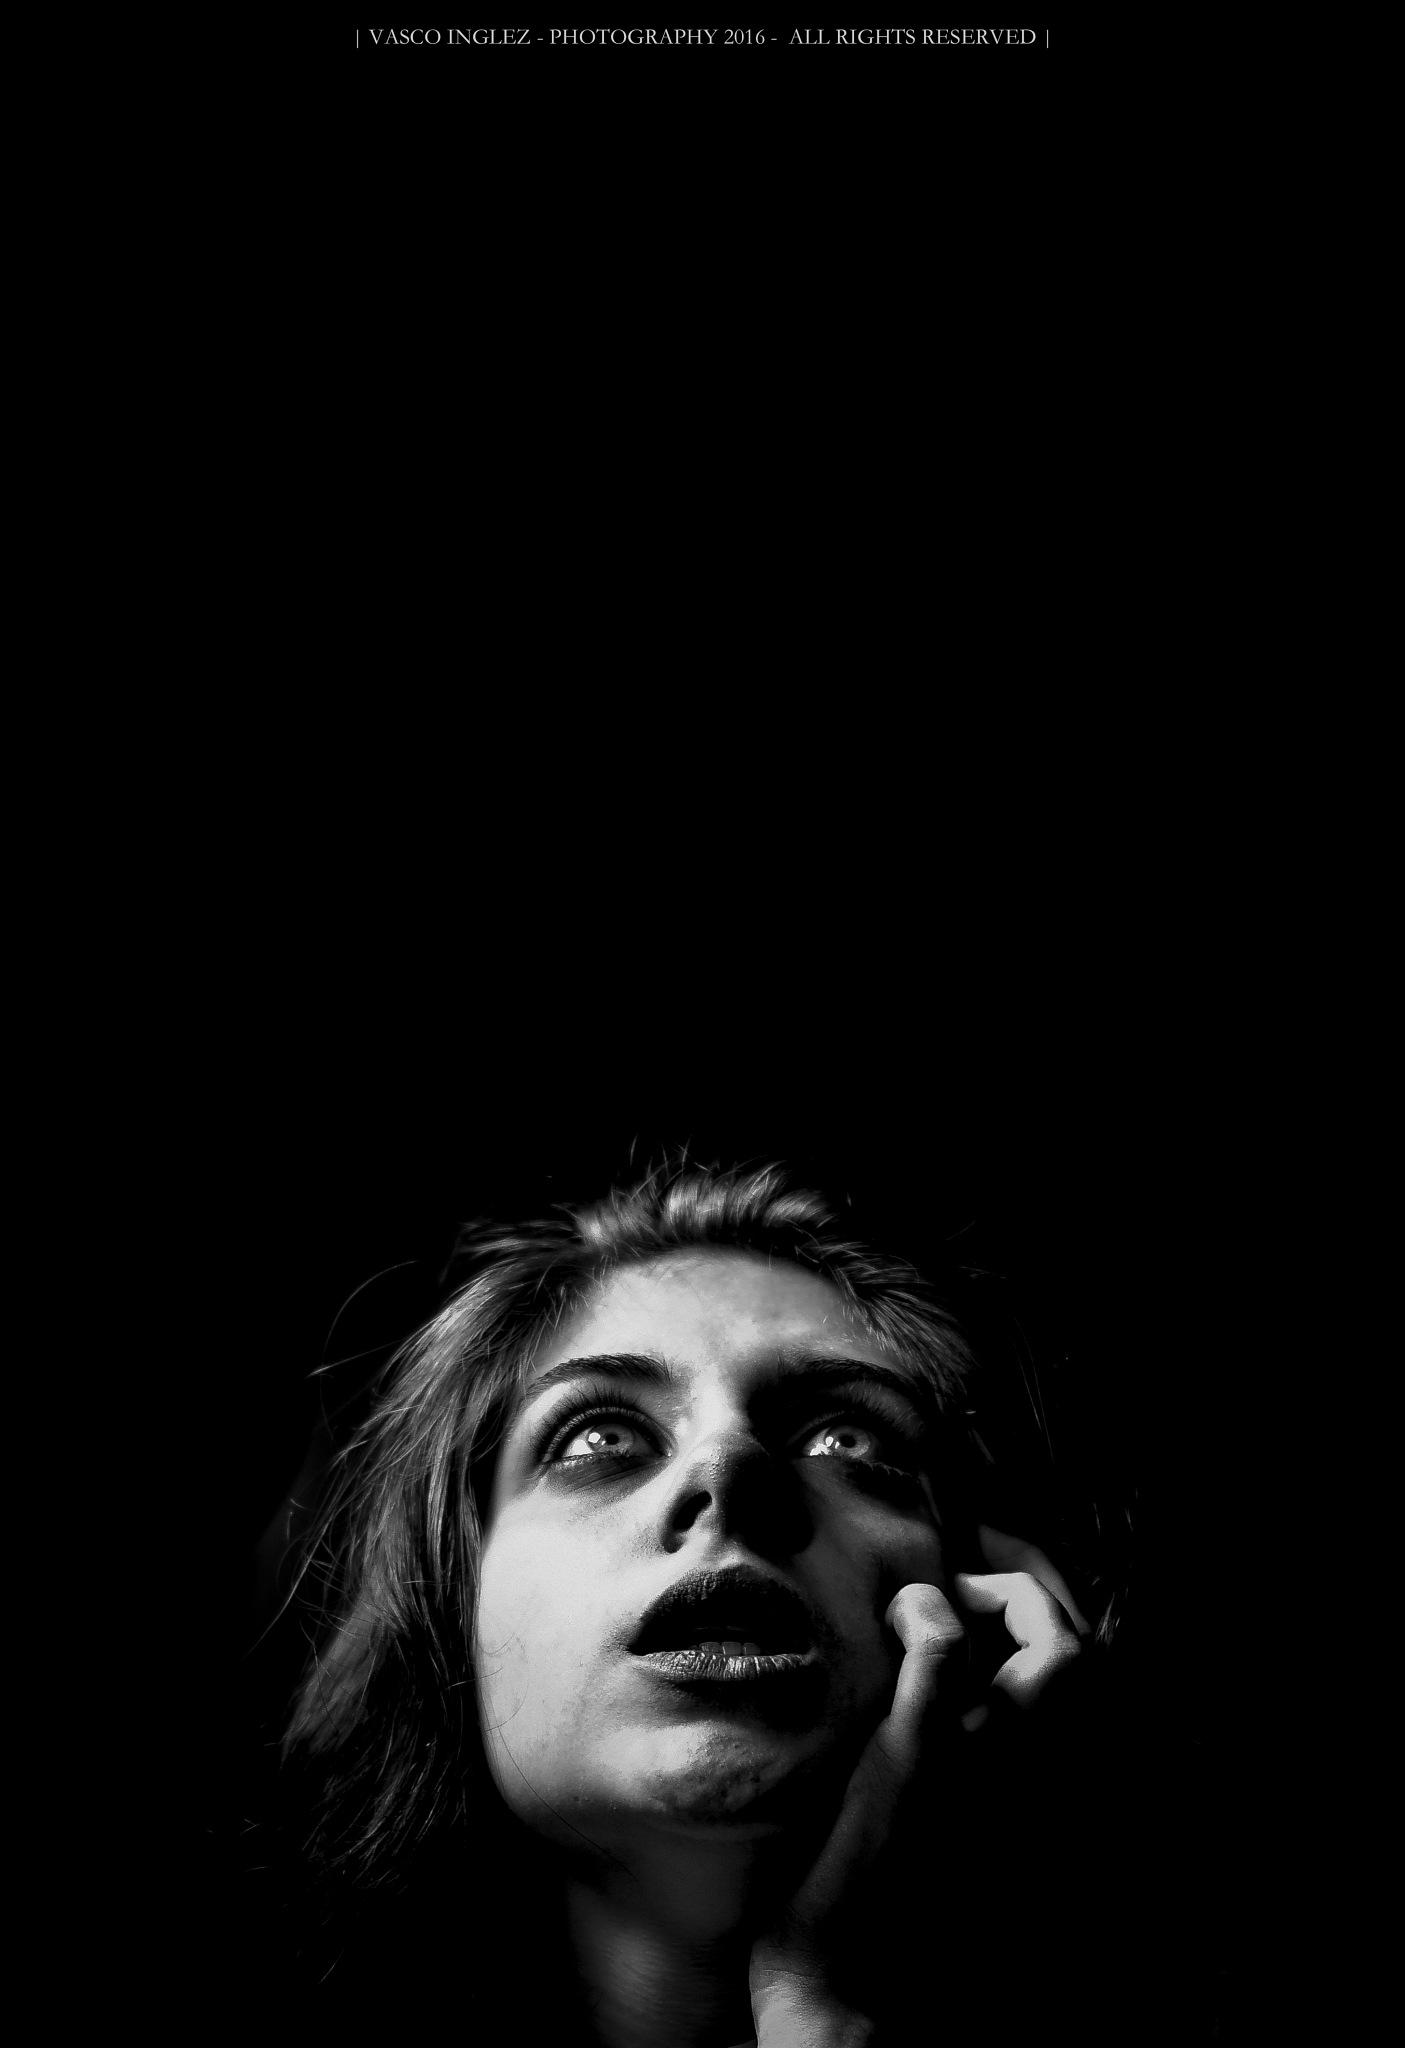 Madness by Vasco Inglez